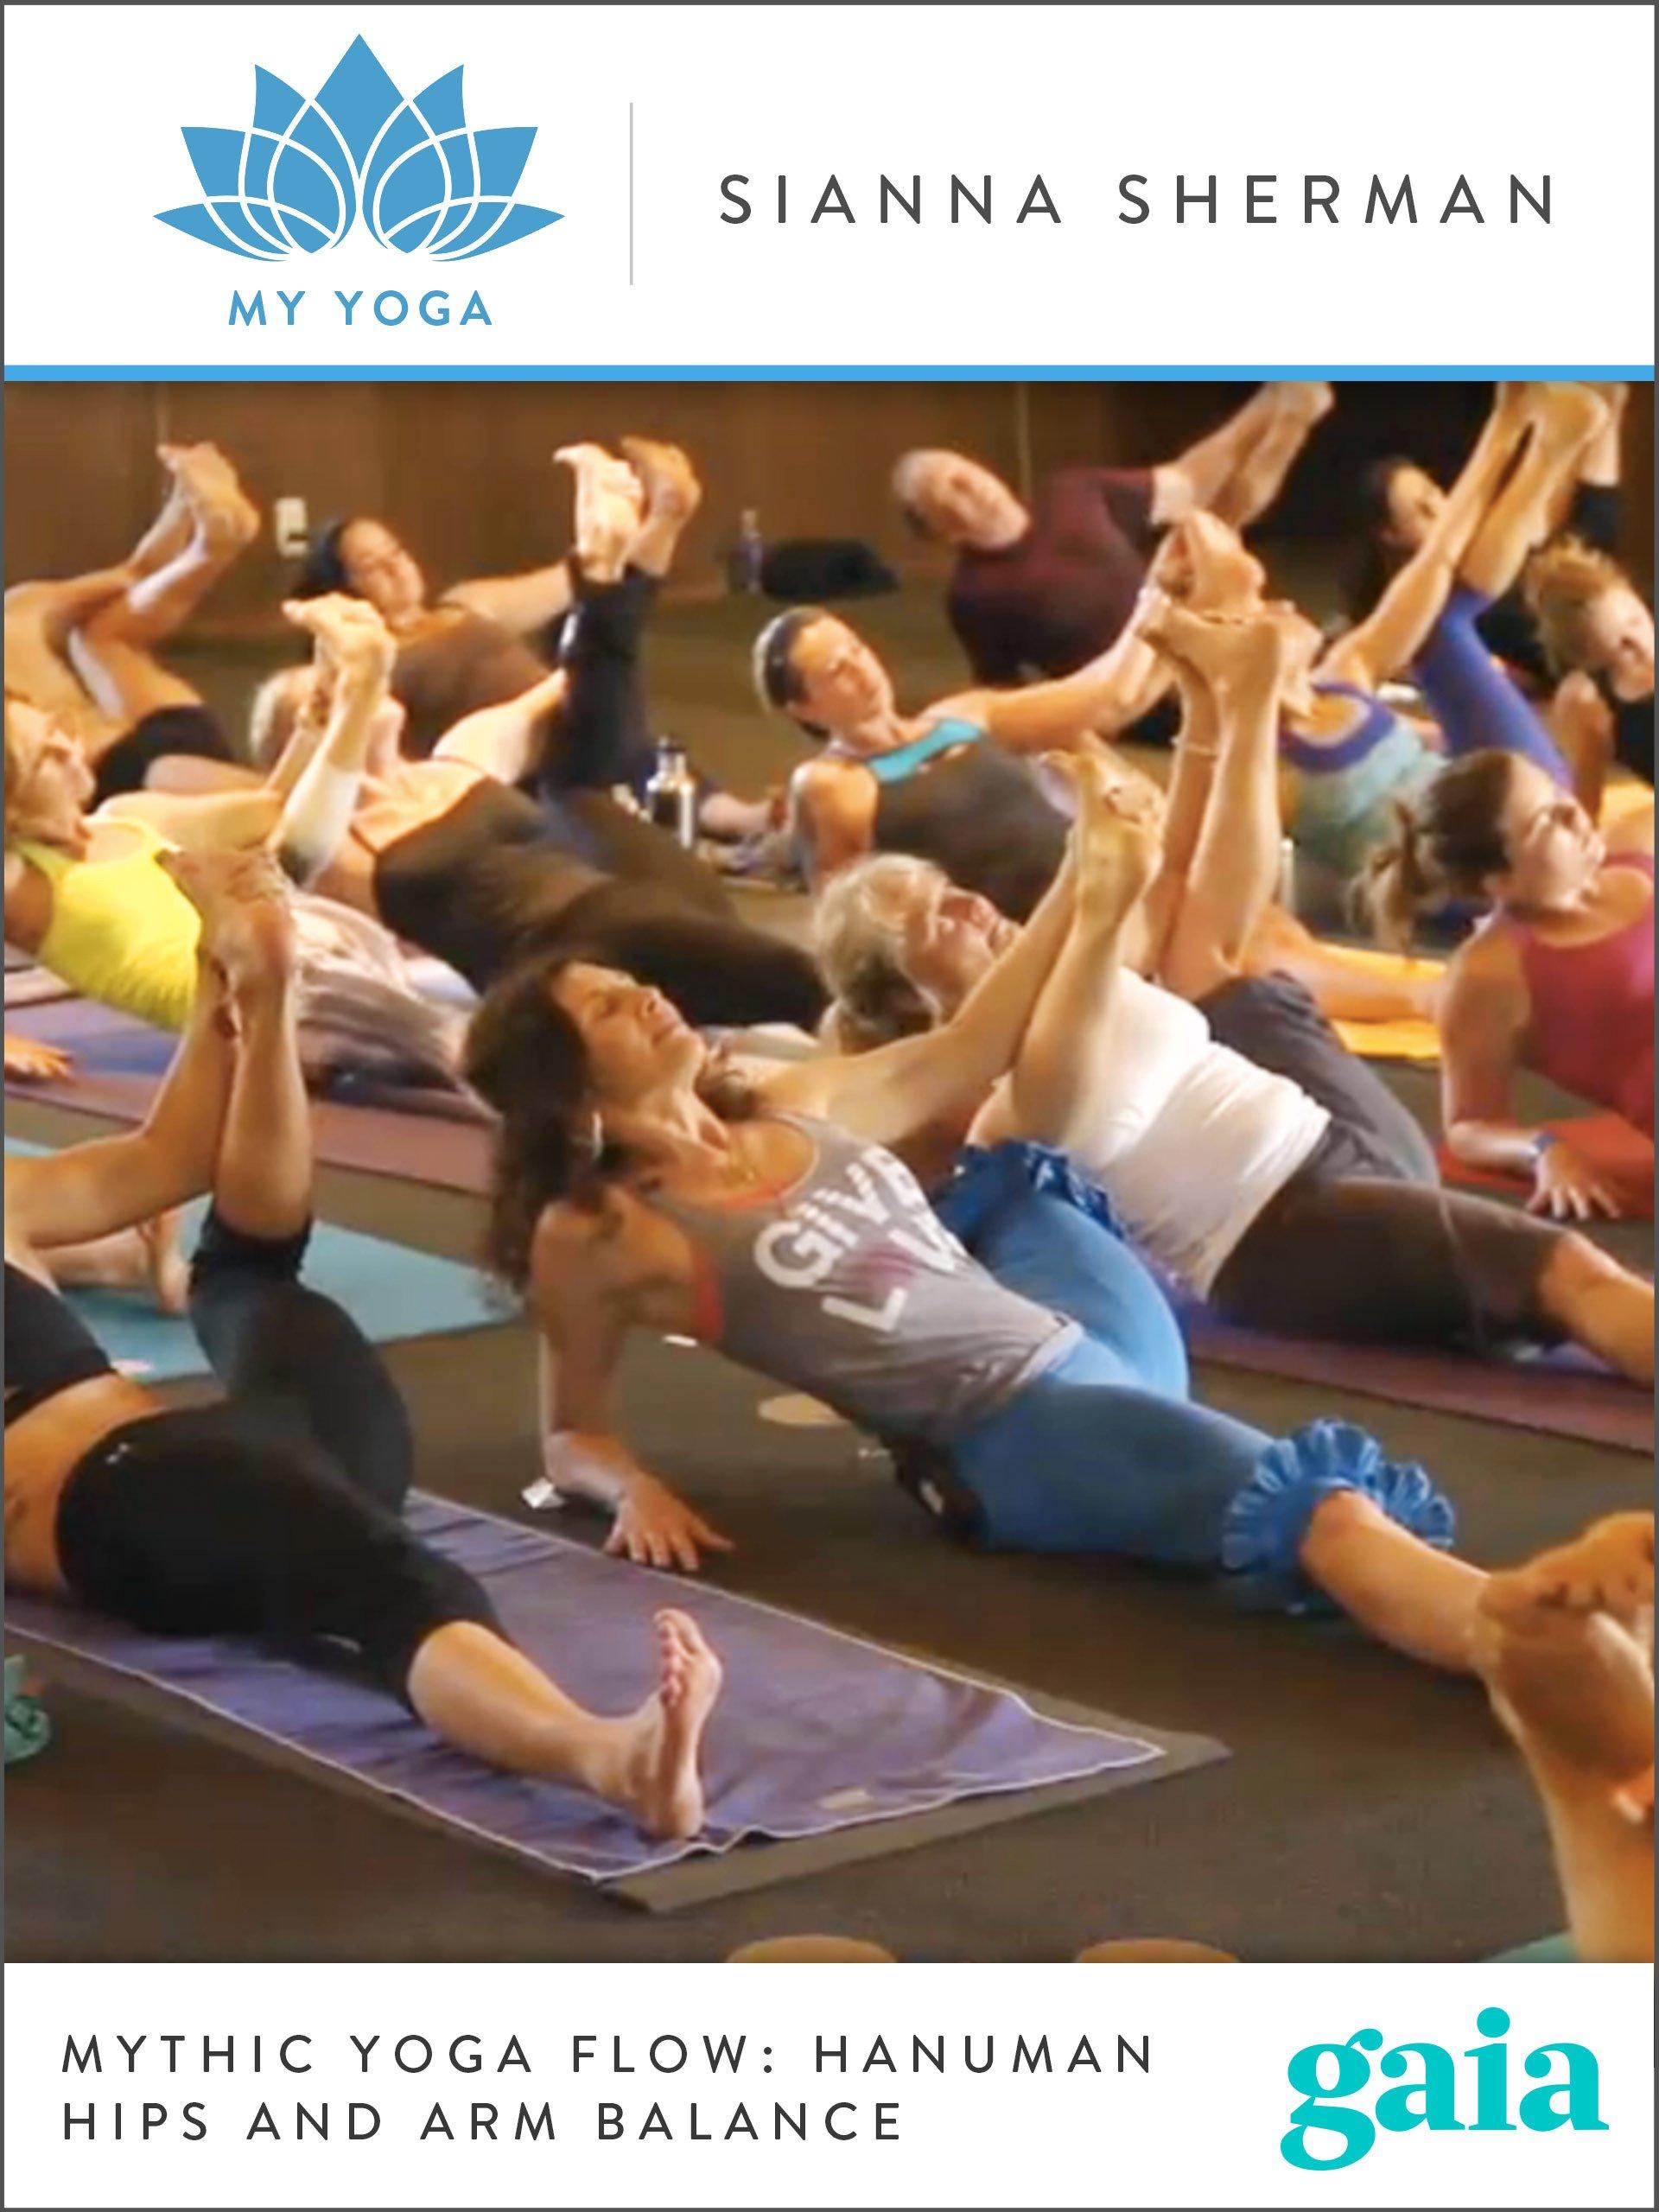 Amazon.com: Mythic Yoga Flow: Hanuman Hips and Arm Balance ...